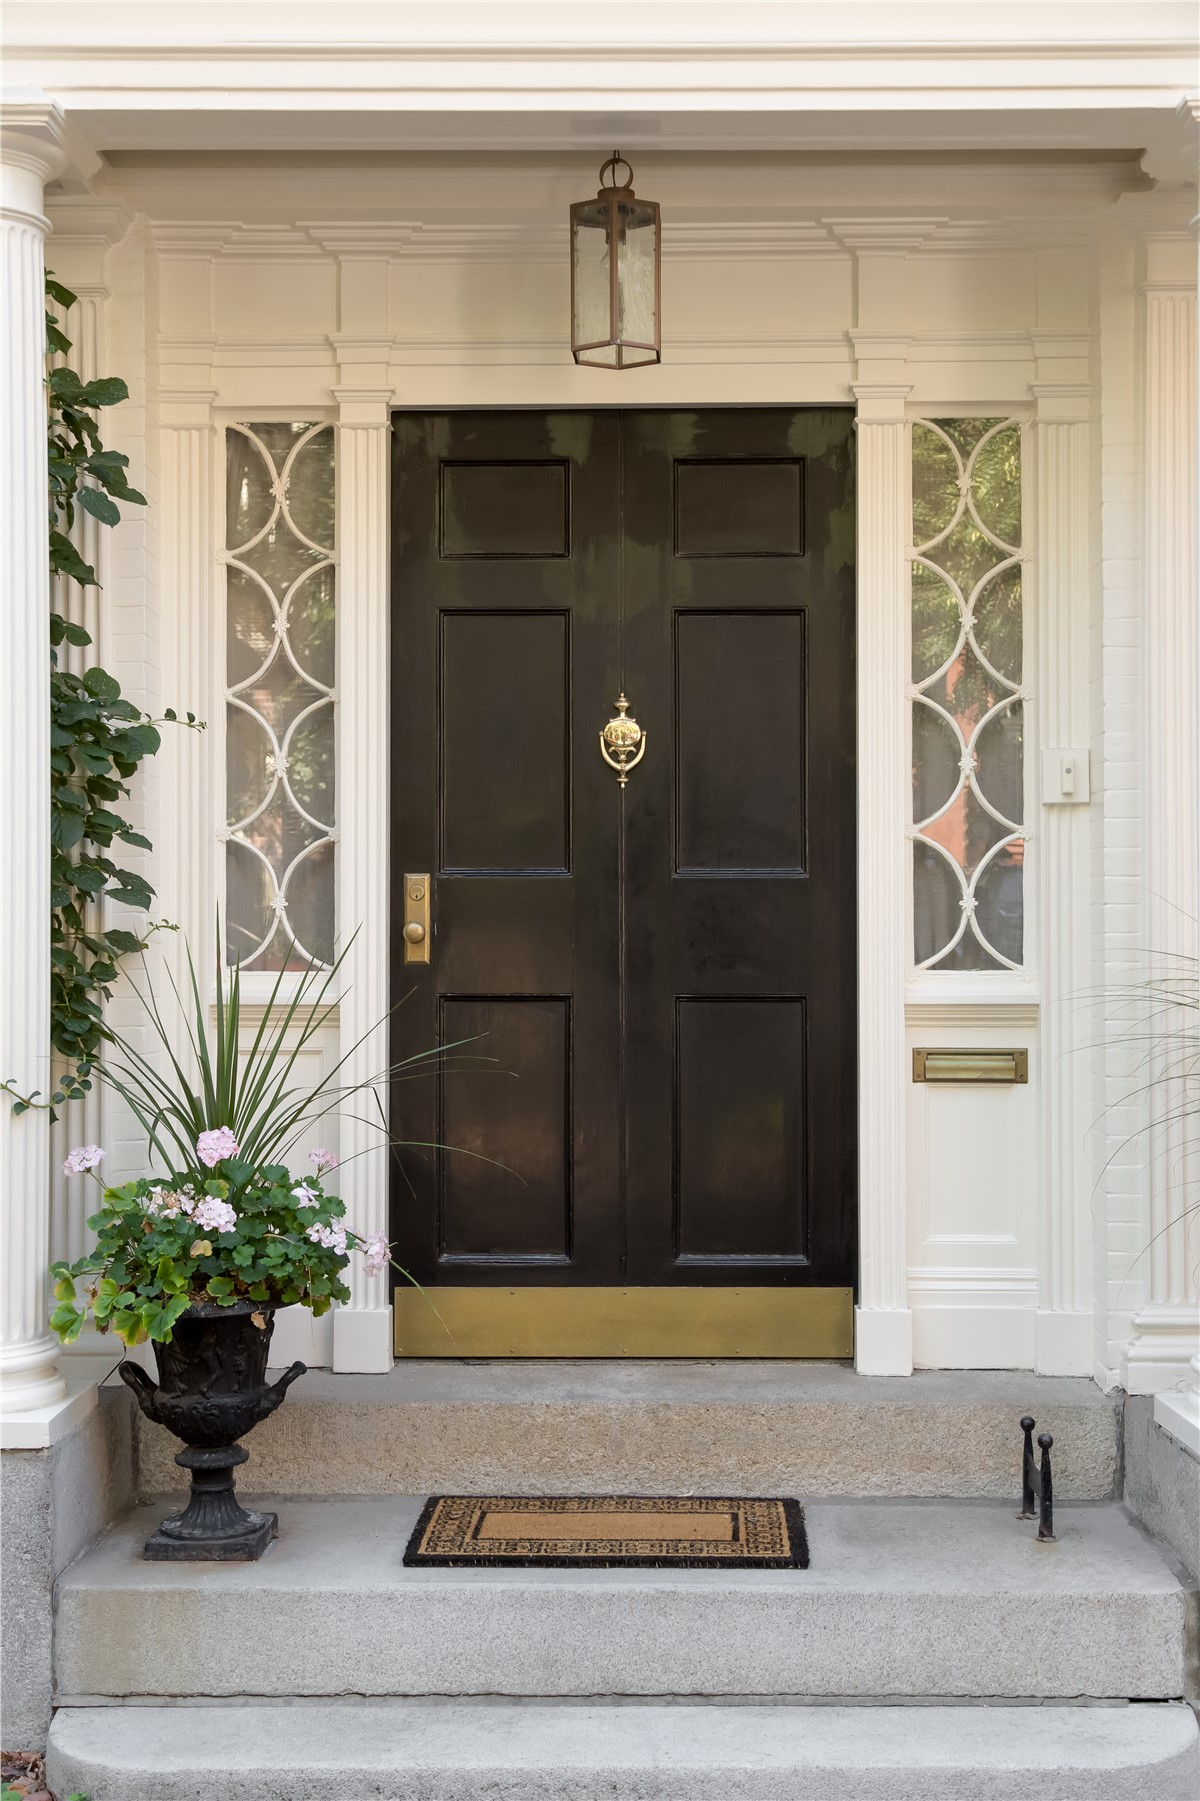 Dallas Steel Entry Doors | Dallas Steel Entry Door Installers ...